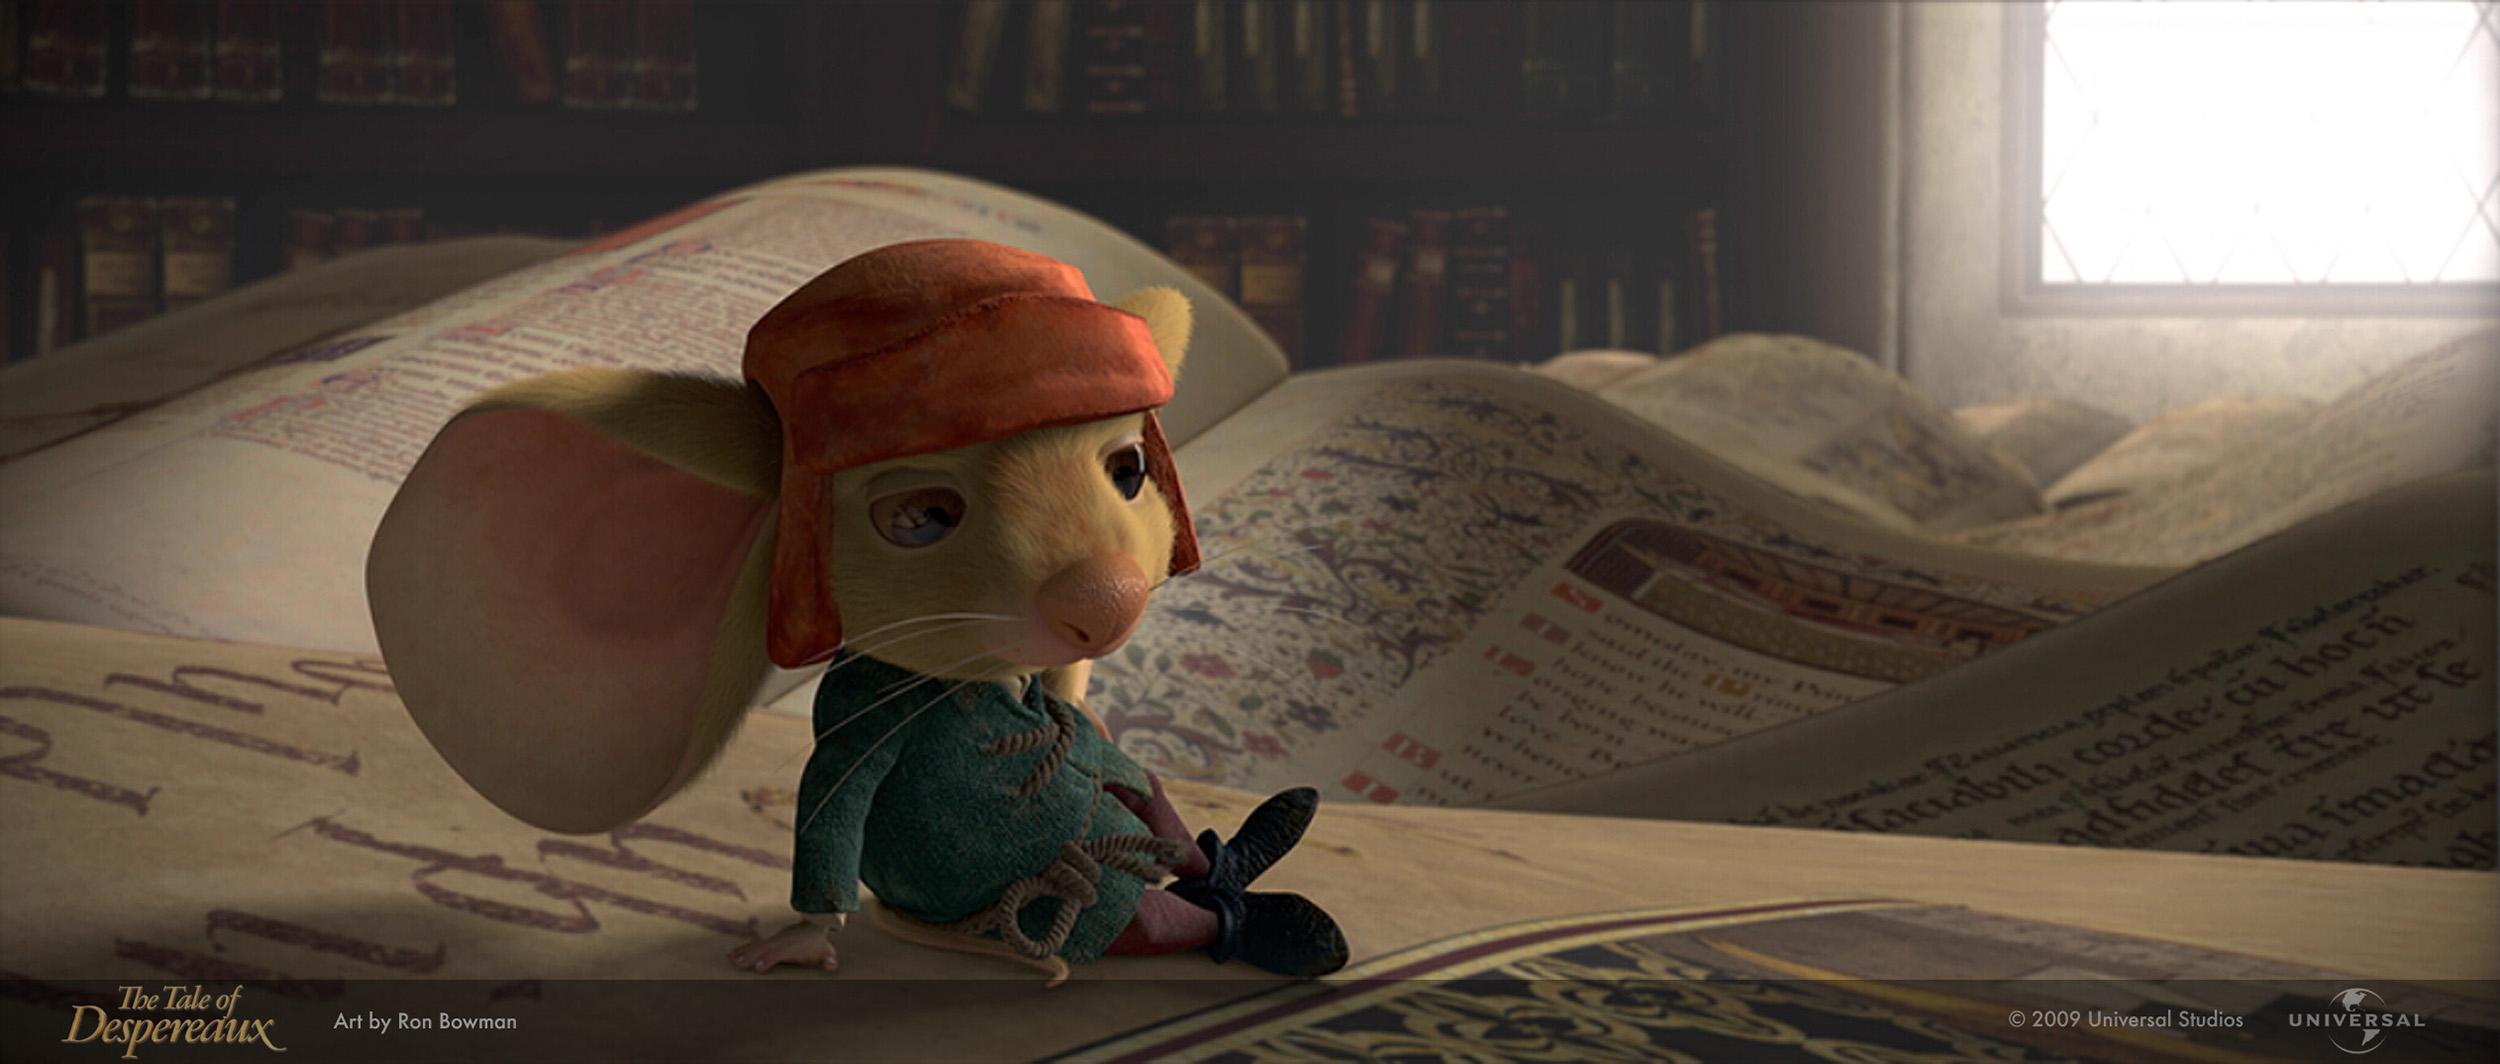 despereaux_books01_comp.jpg